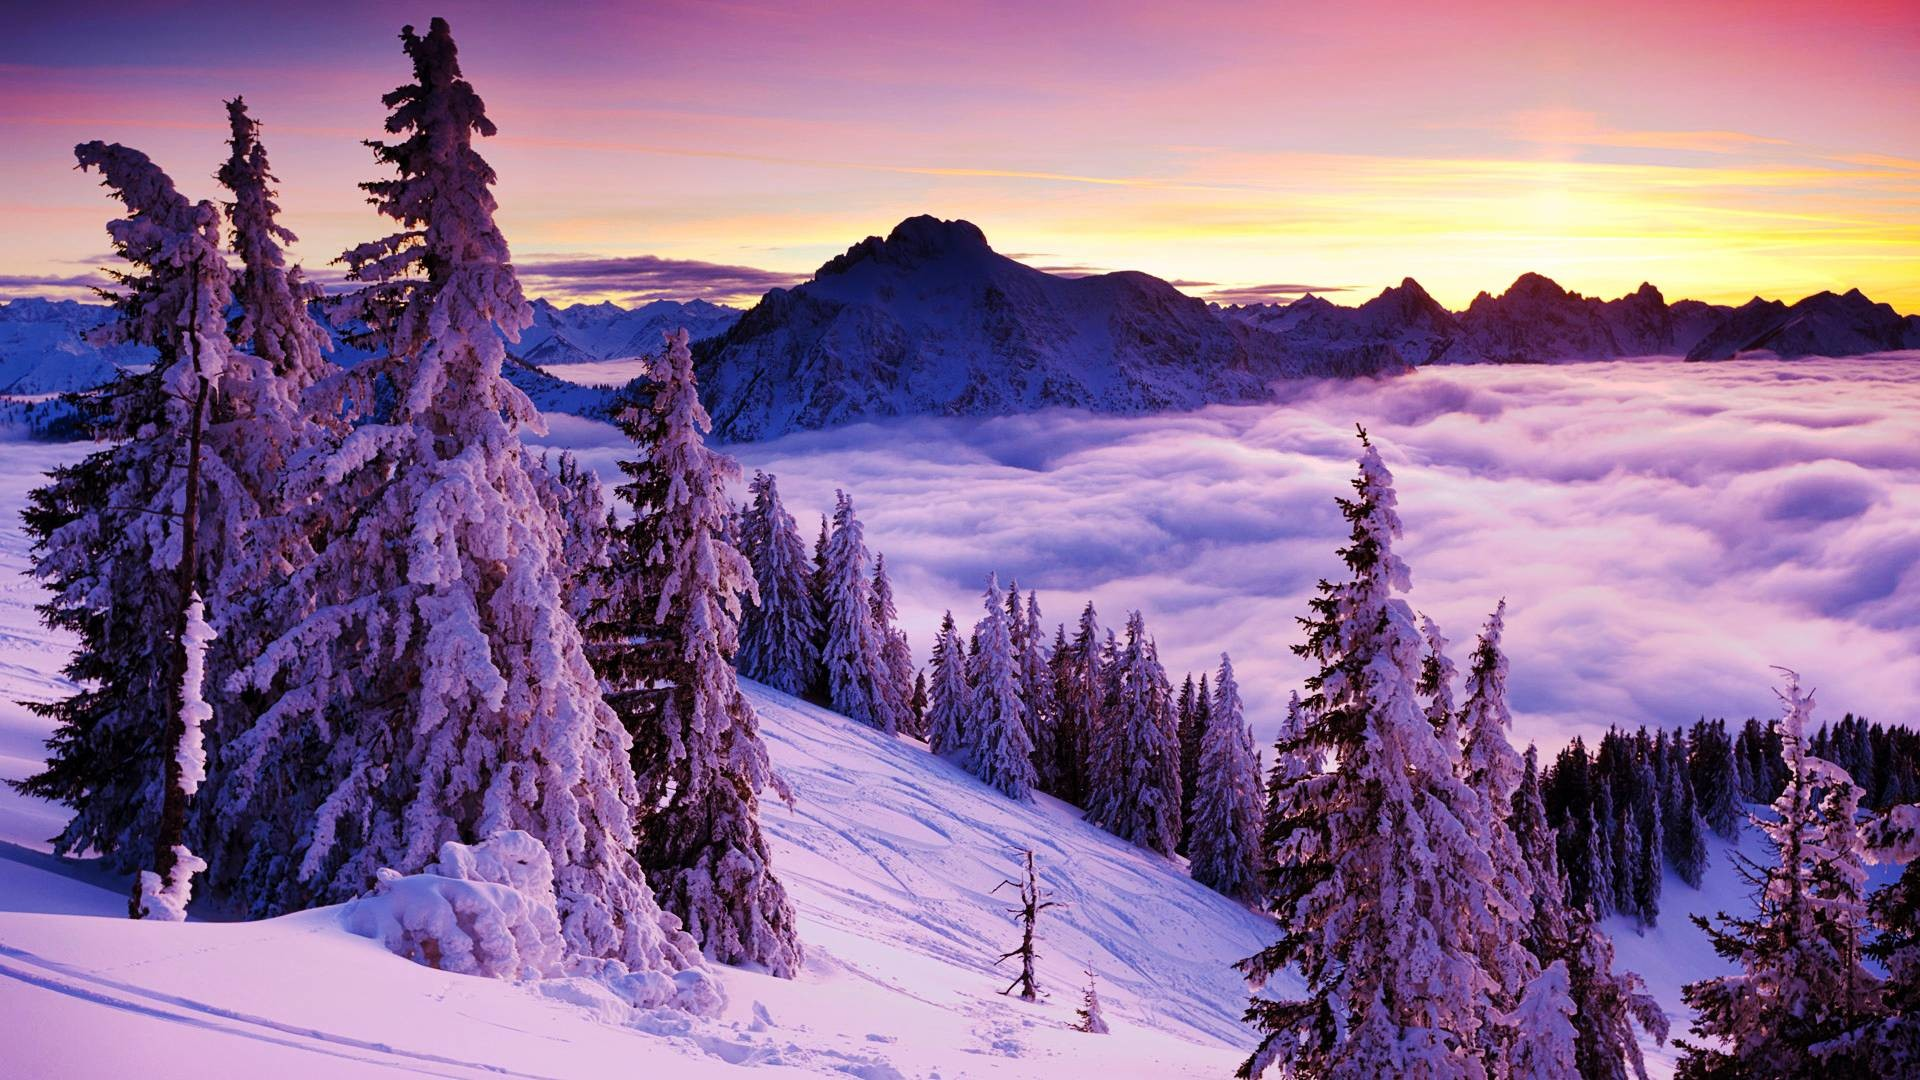 Beautiful Winter Landscape Hd Images 3 HD Wallpapers | Natureimgz.